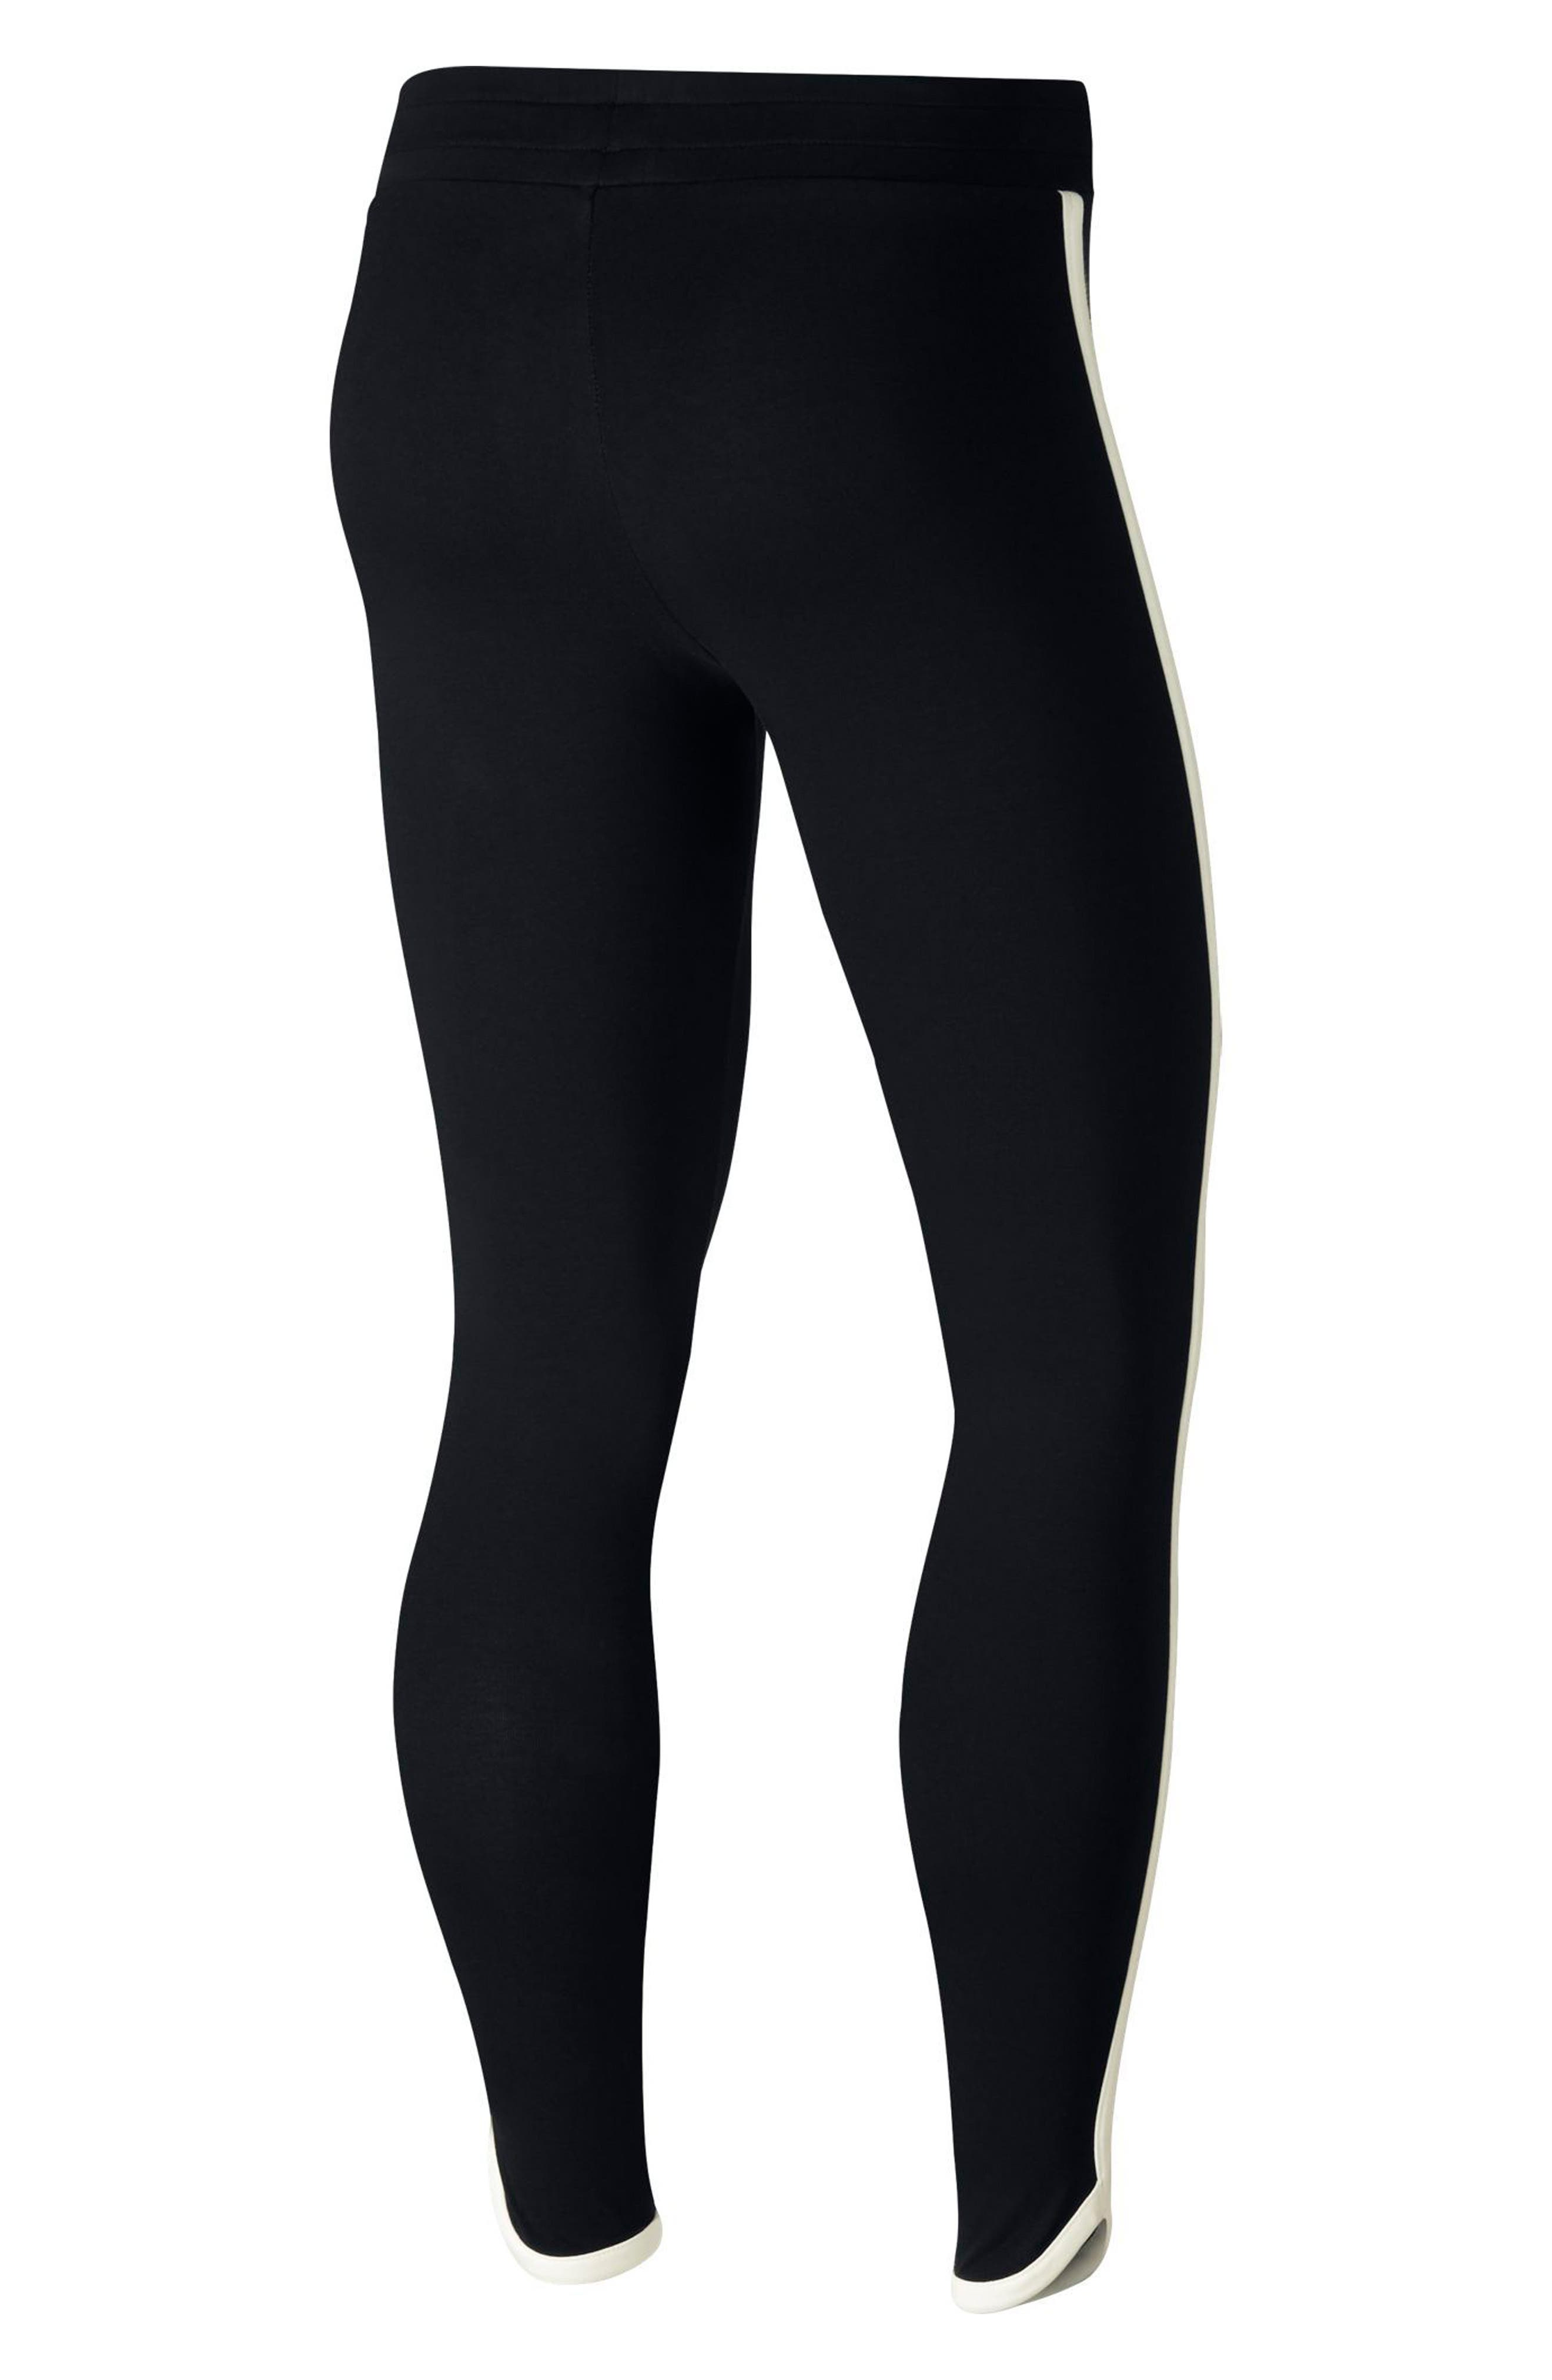 Sportswear Women's Leggings,                             Alternate thumbnail 2, color,                             010